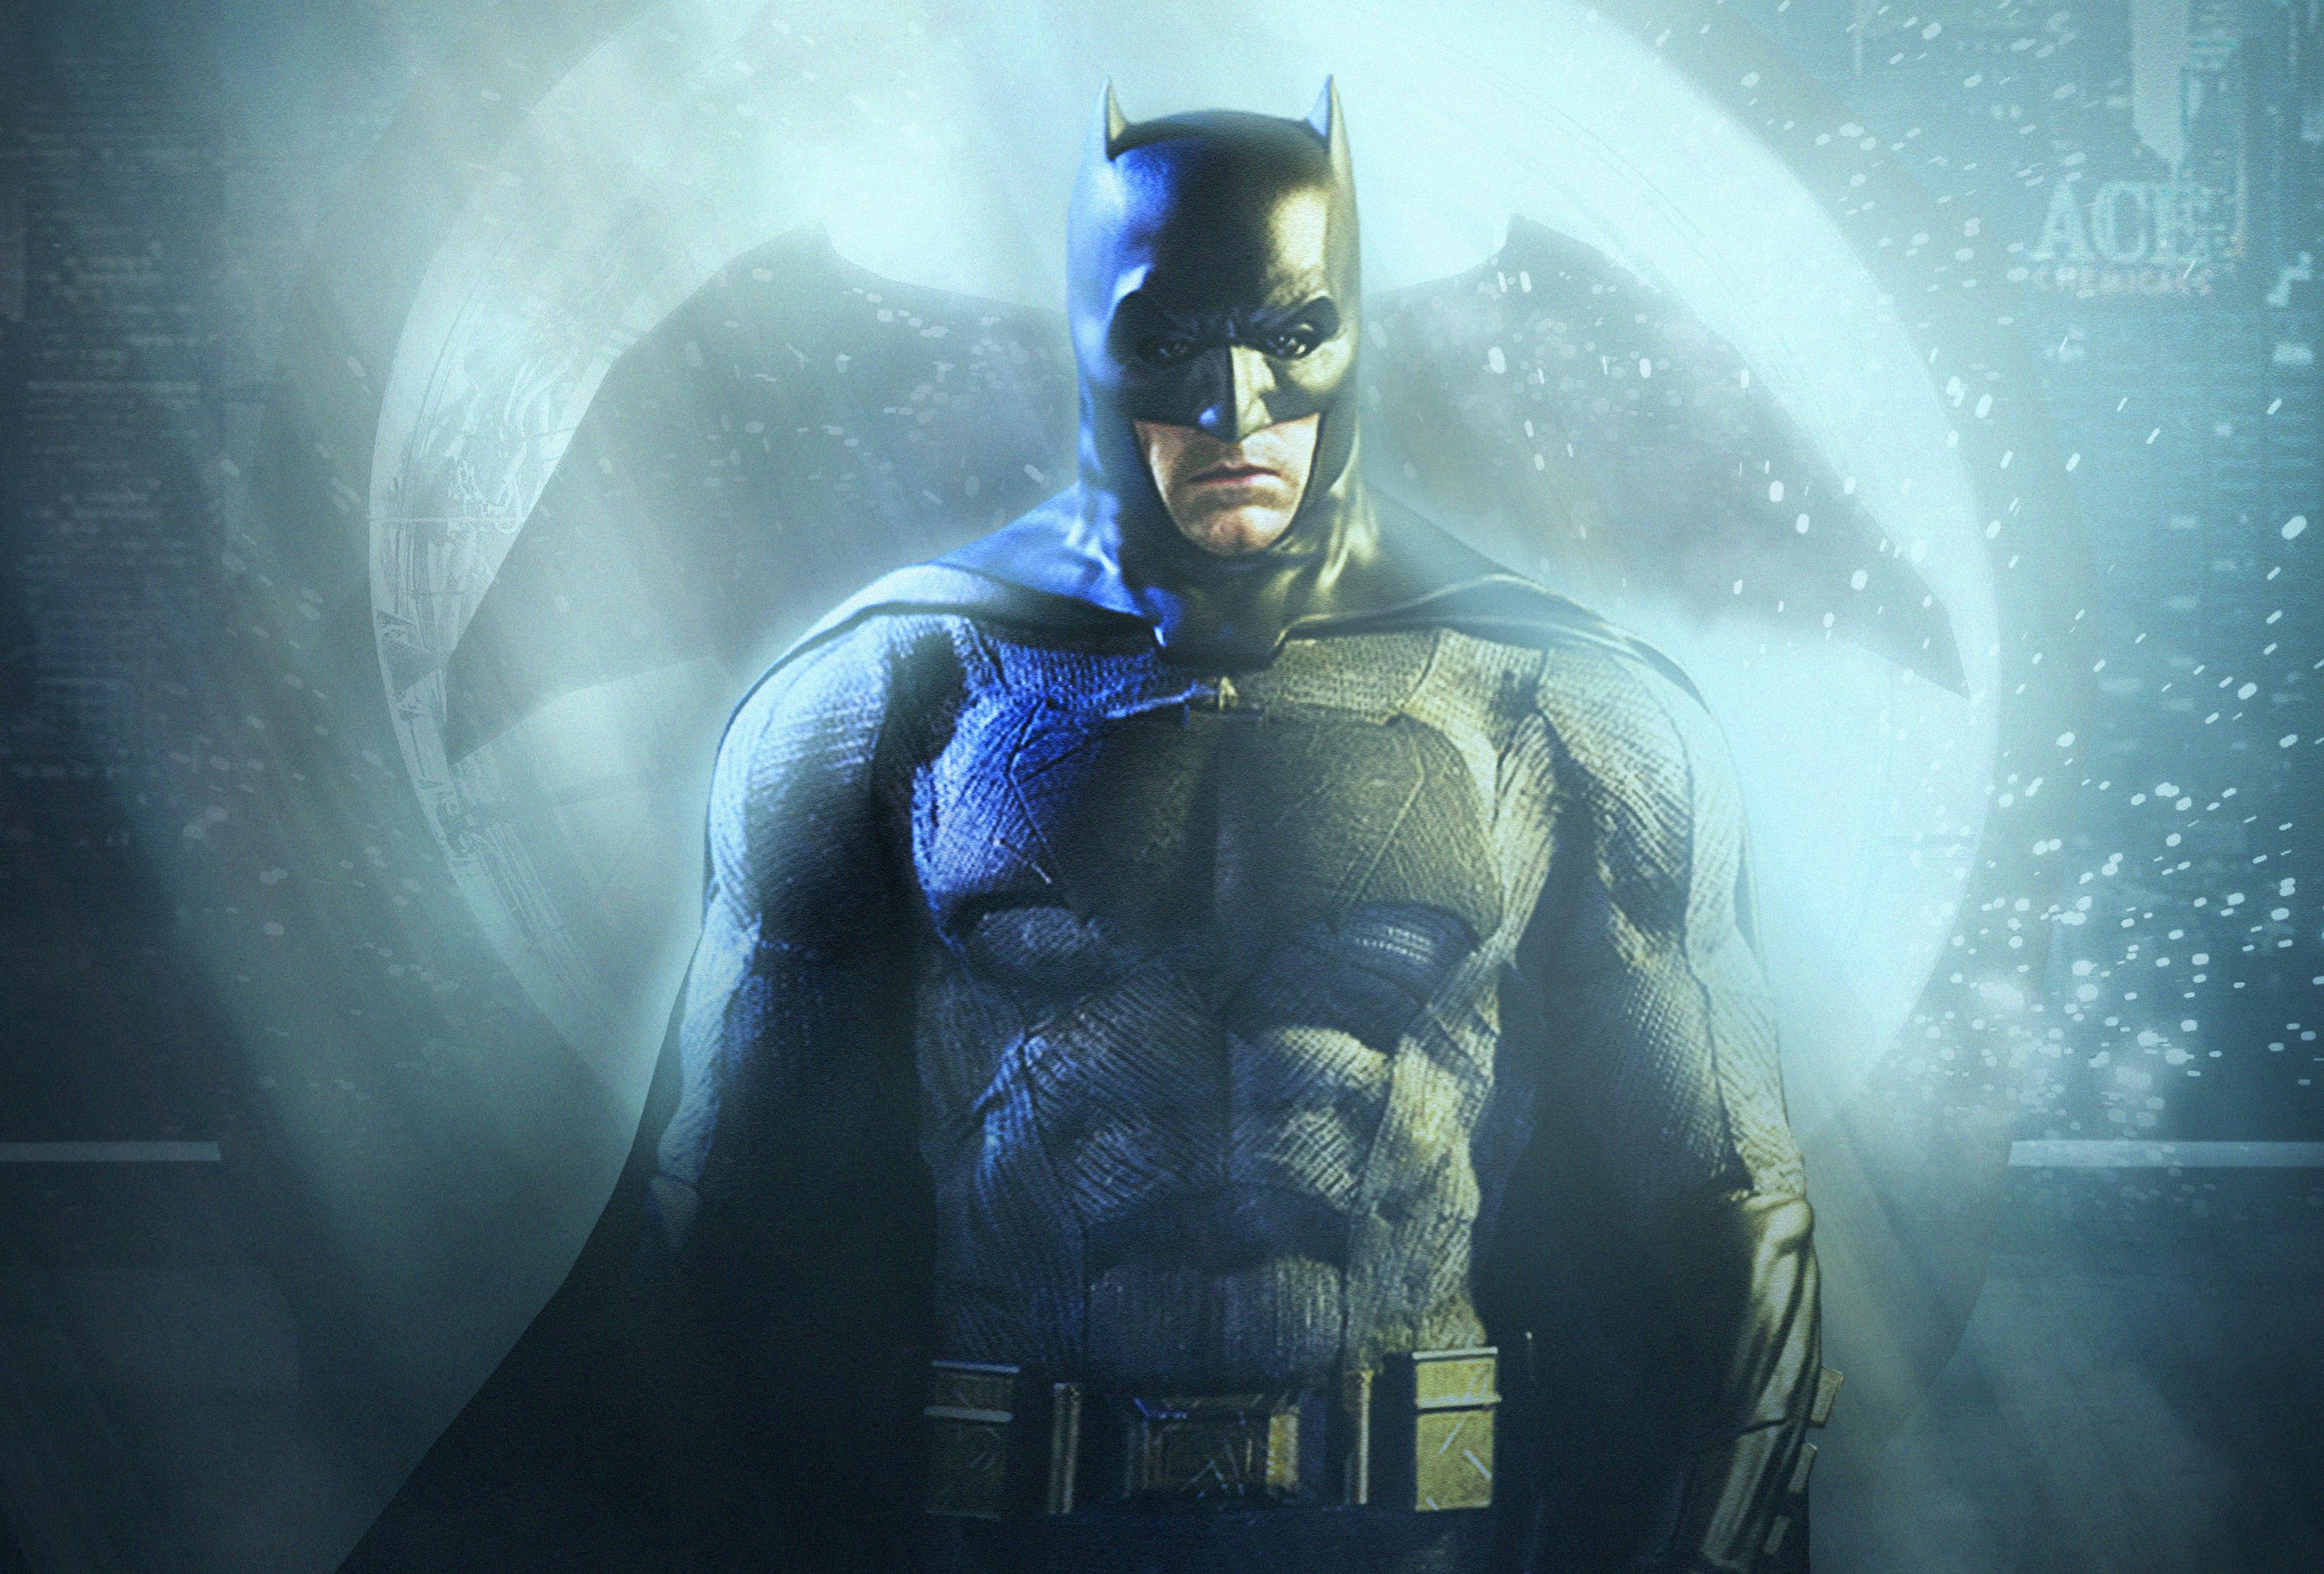 Batman Justice League 4k 2017 Art, HD Movies, 4k ...